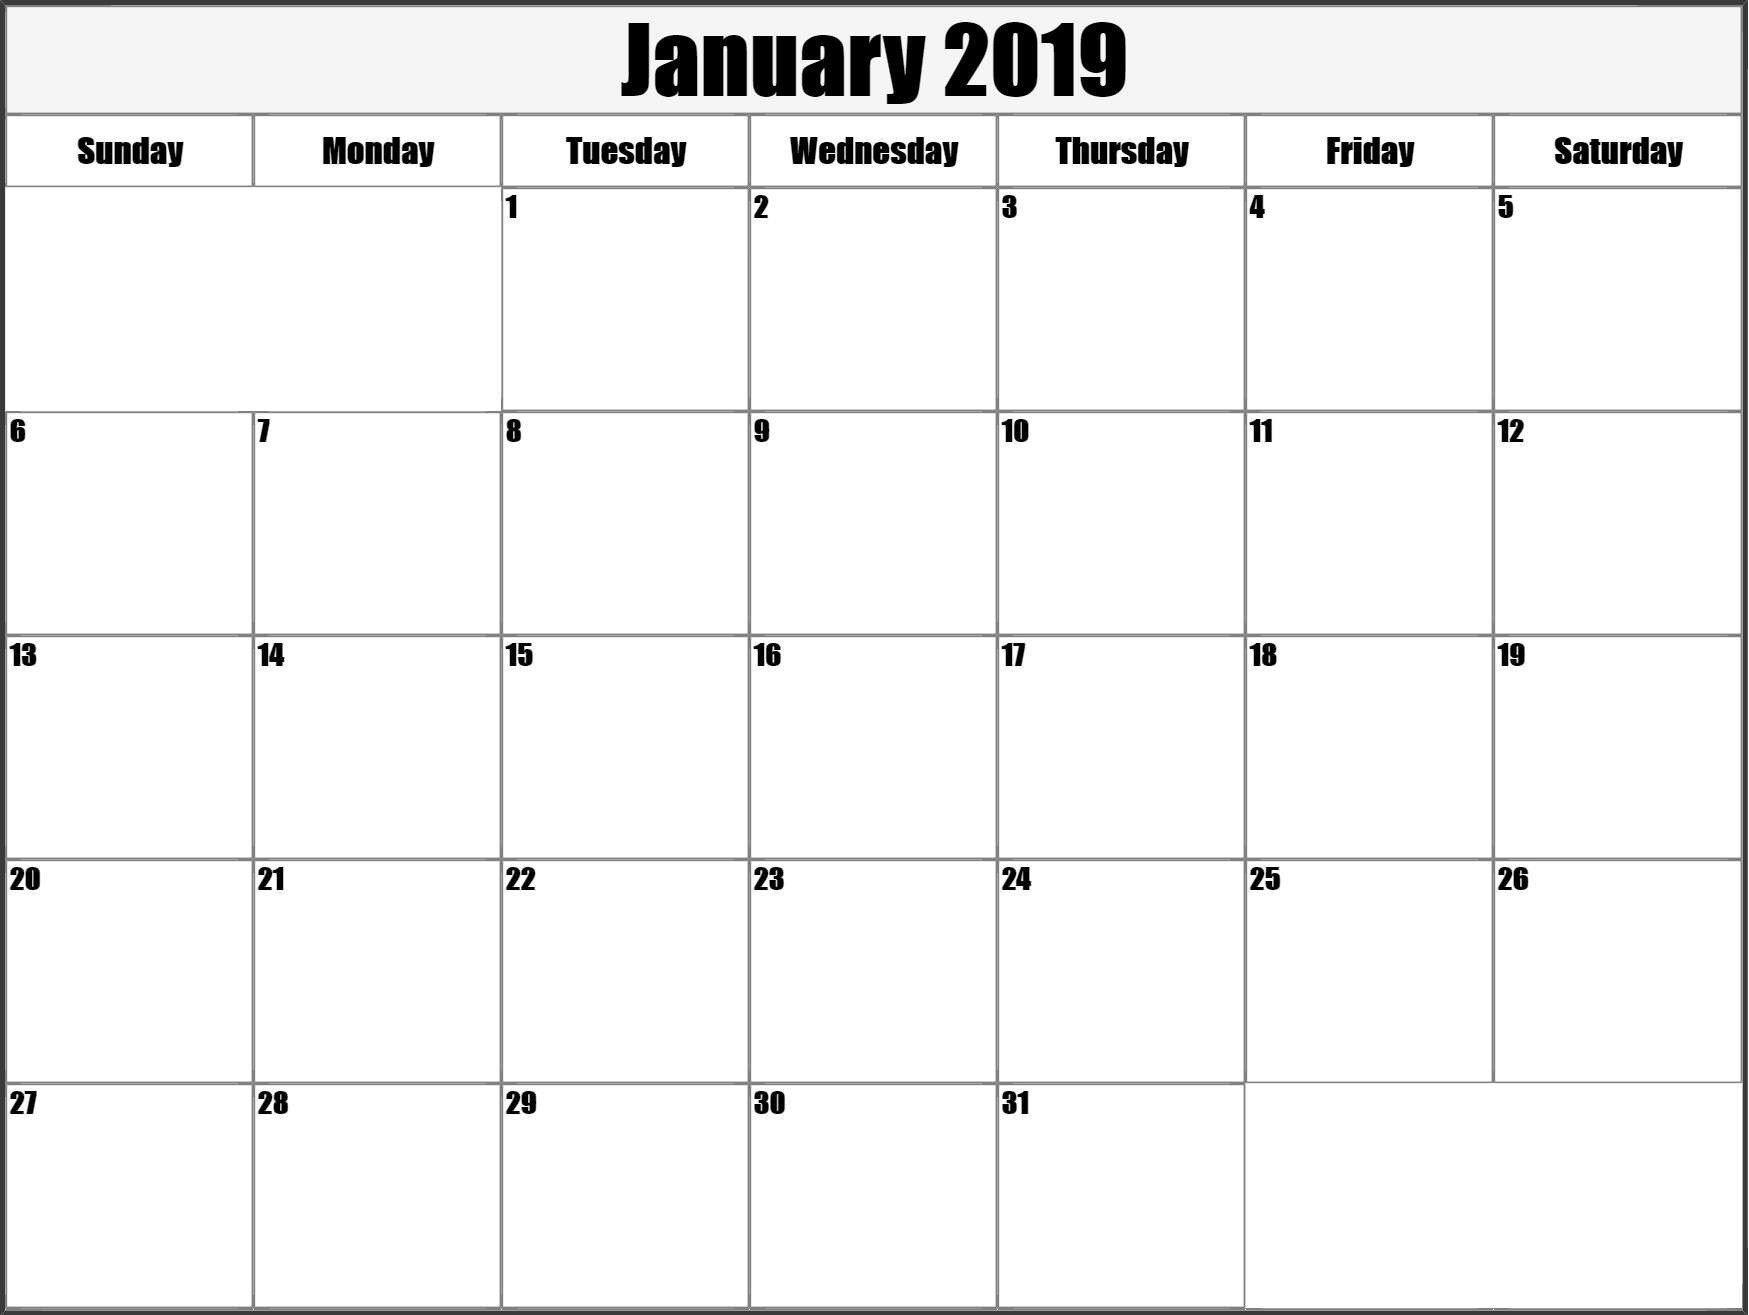 2019 January Calendar #printable Planner Free Download-January 2020 Calendar Microsoft Word